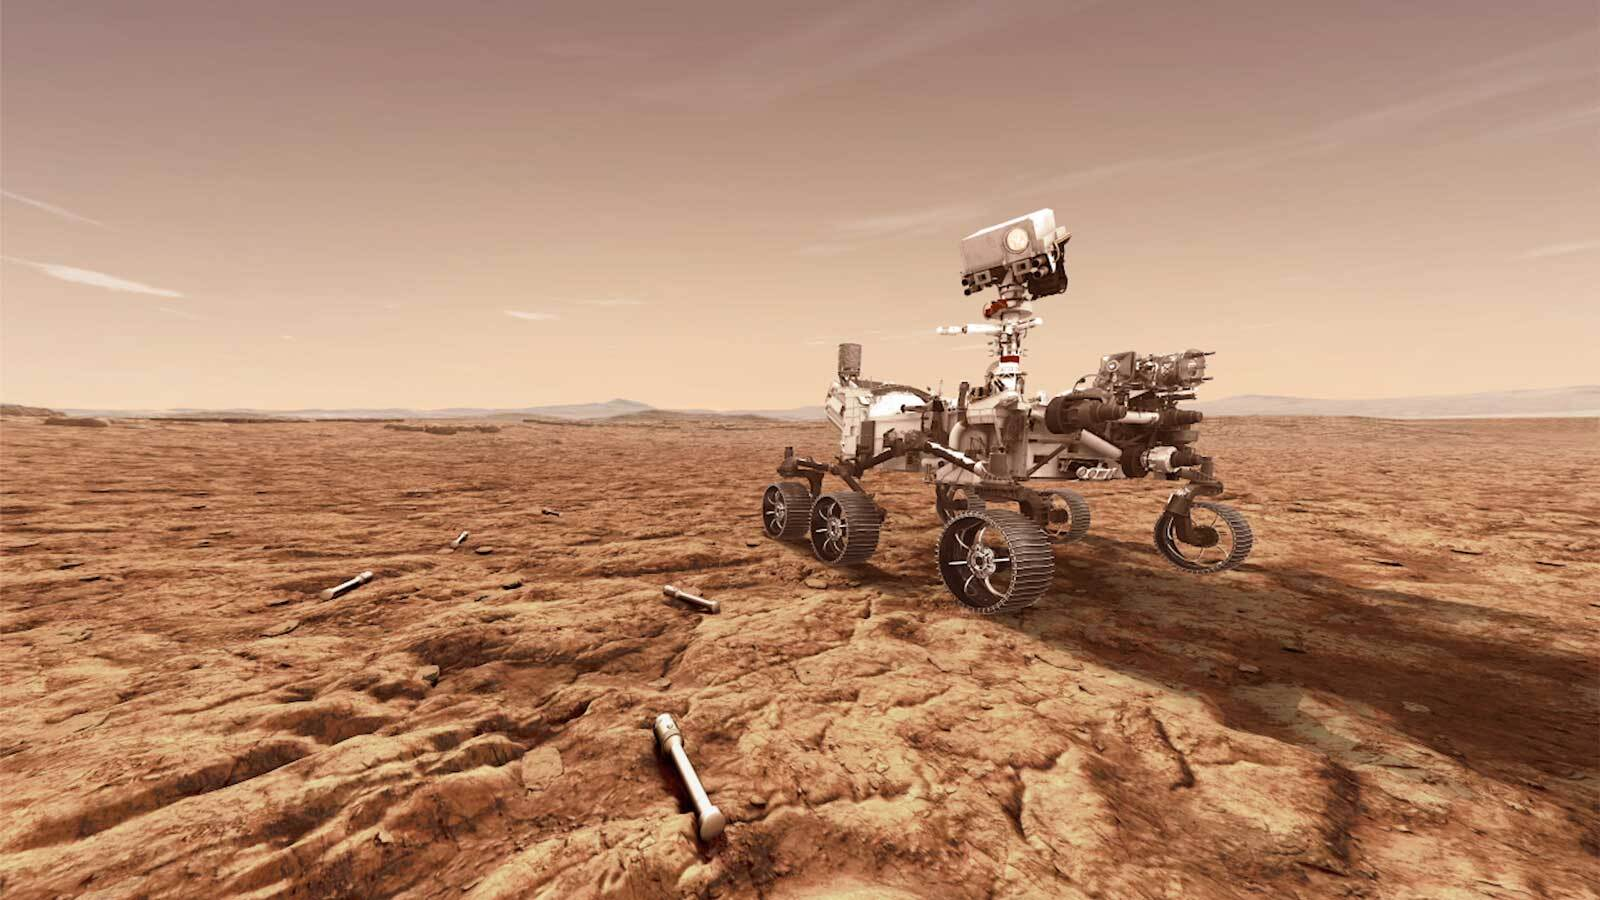 Justin Simon Shepherds Perseverance Through First Phase of Martian Rock Sampling